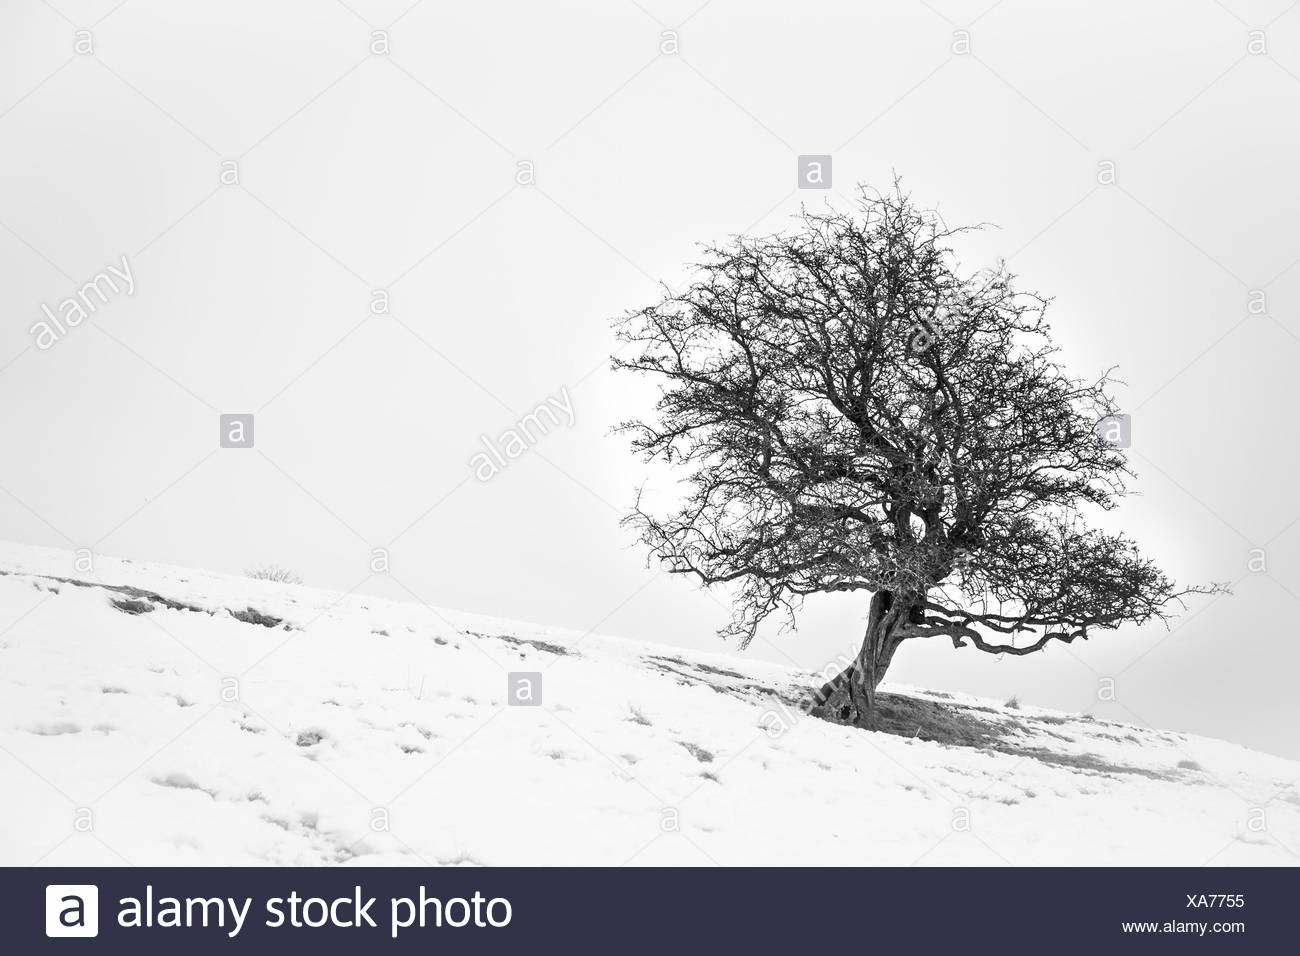 single lone hawthorn on a snowy hillside - Stock Image